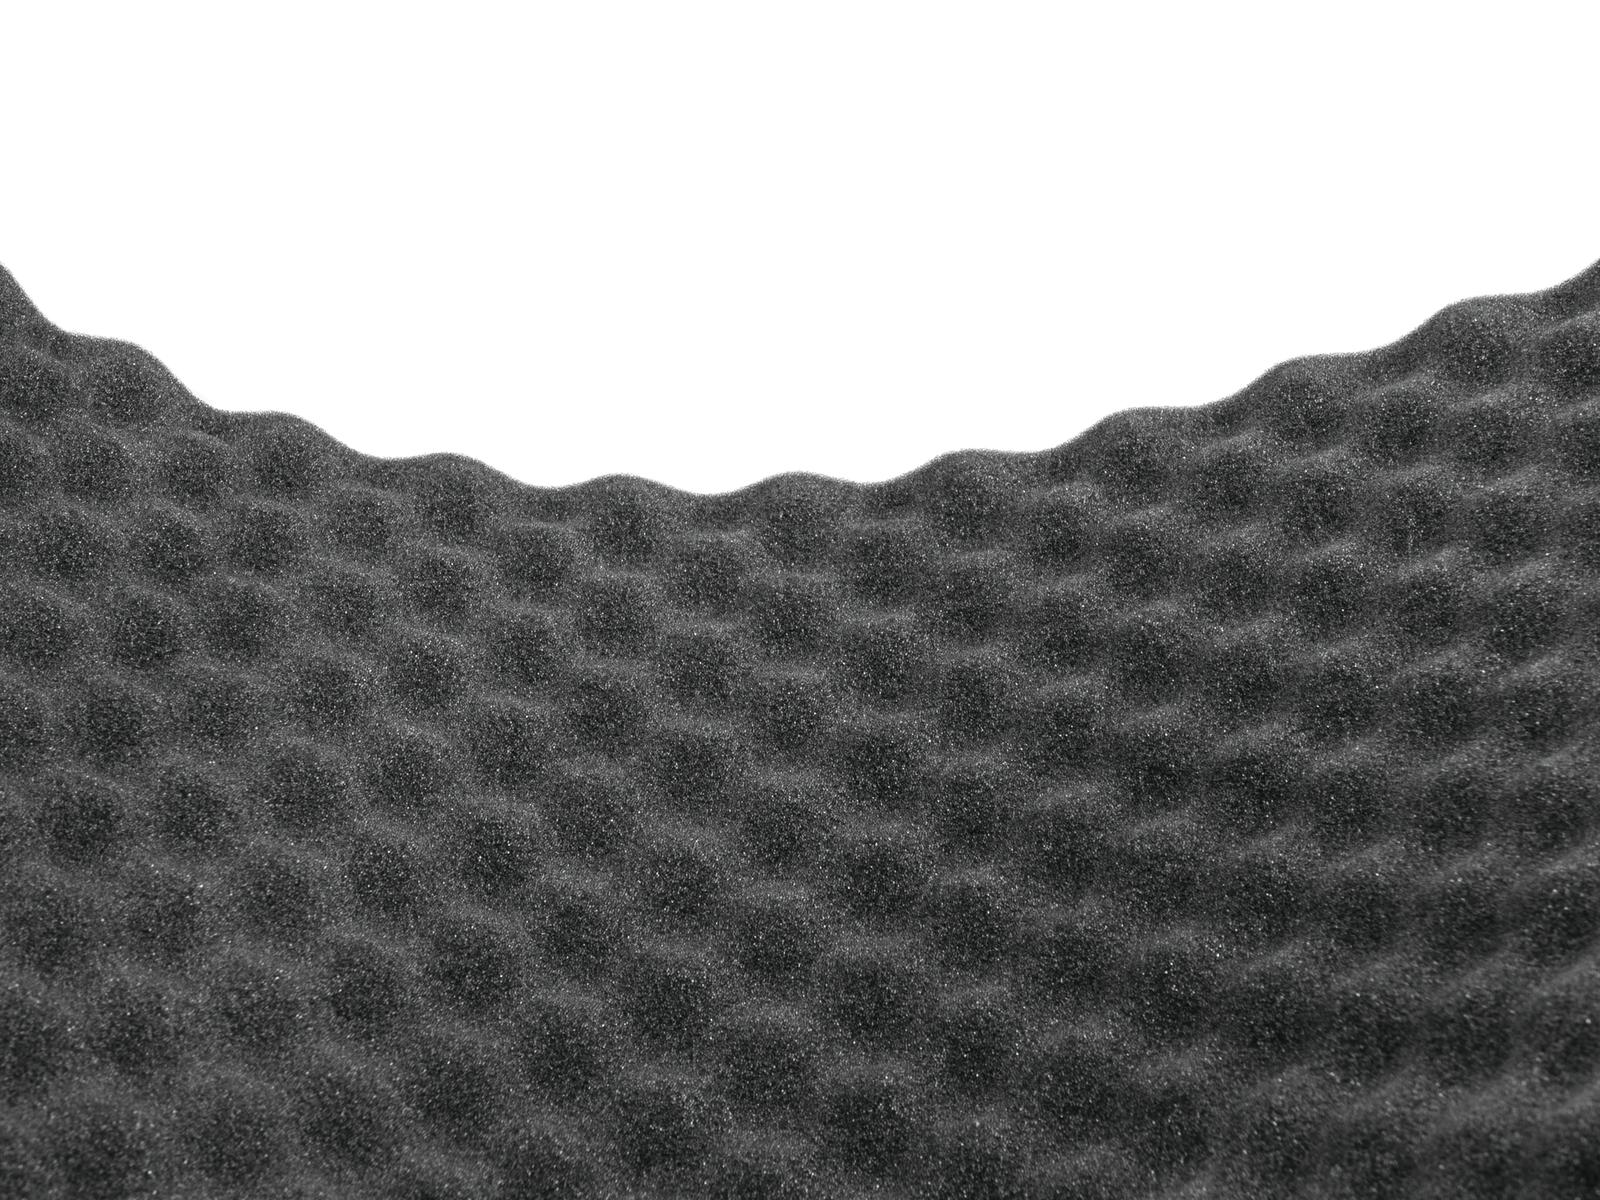 ACCESSORY Isoliermatte, Noppen Höhe 50mm, 100x206cm